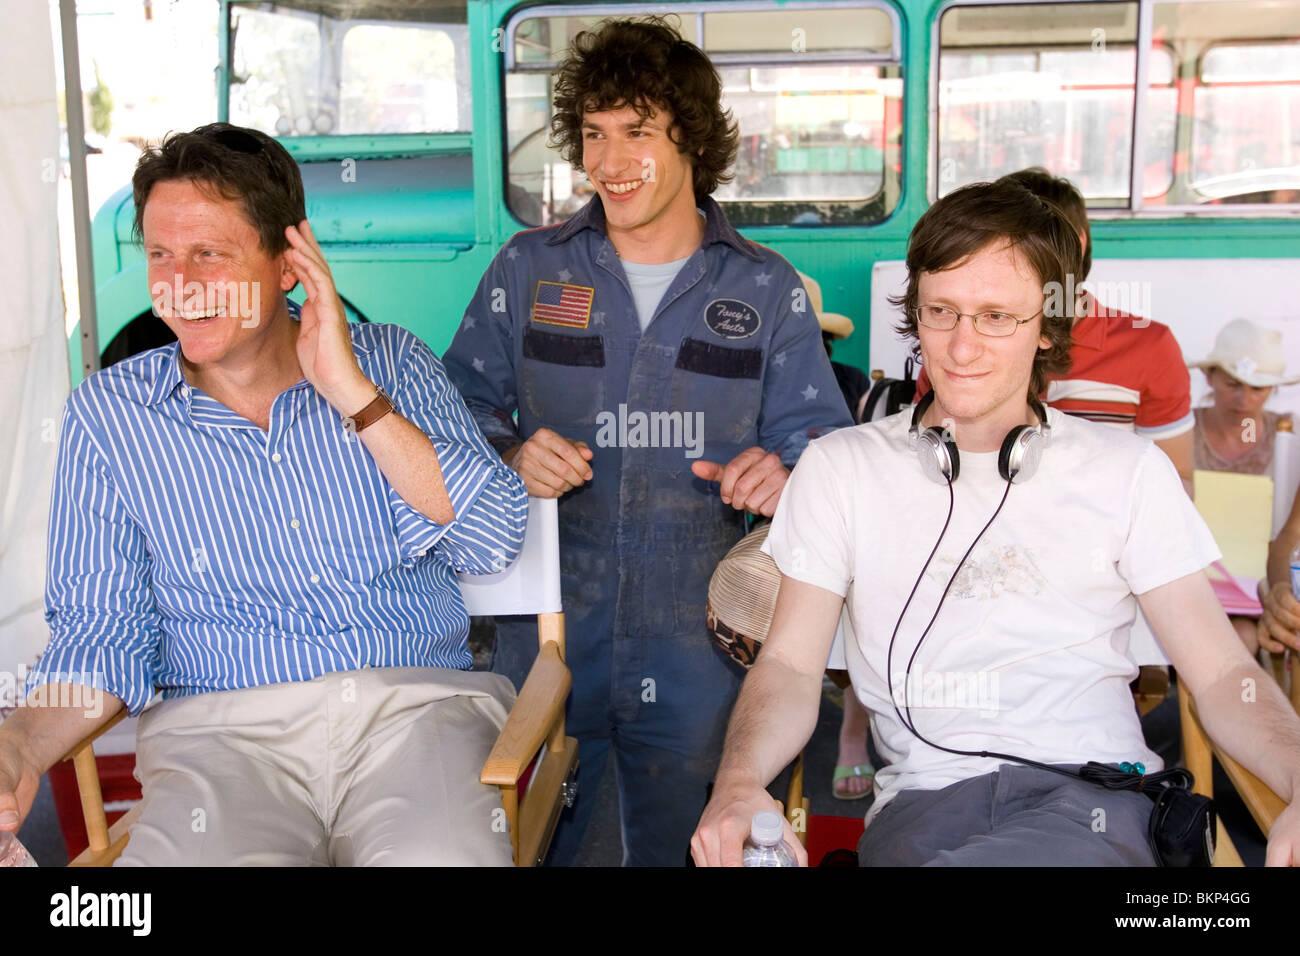 FILMING, O/S 'HOT ROD (2007)' AKIVA SCHAFFER (DIR), ANDY SAMBERG, JOHN GOLDWYN (PROD) HORO 001-24 - Stock Image